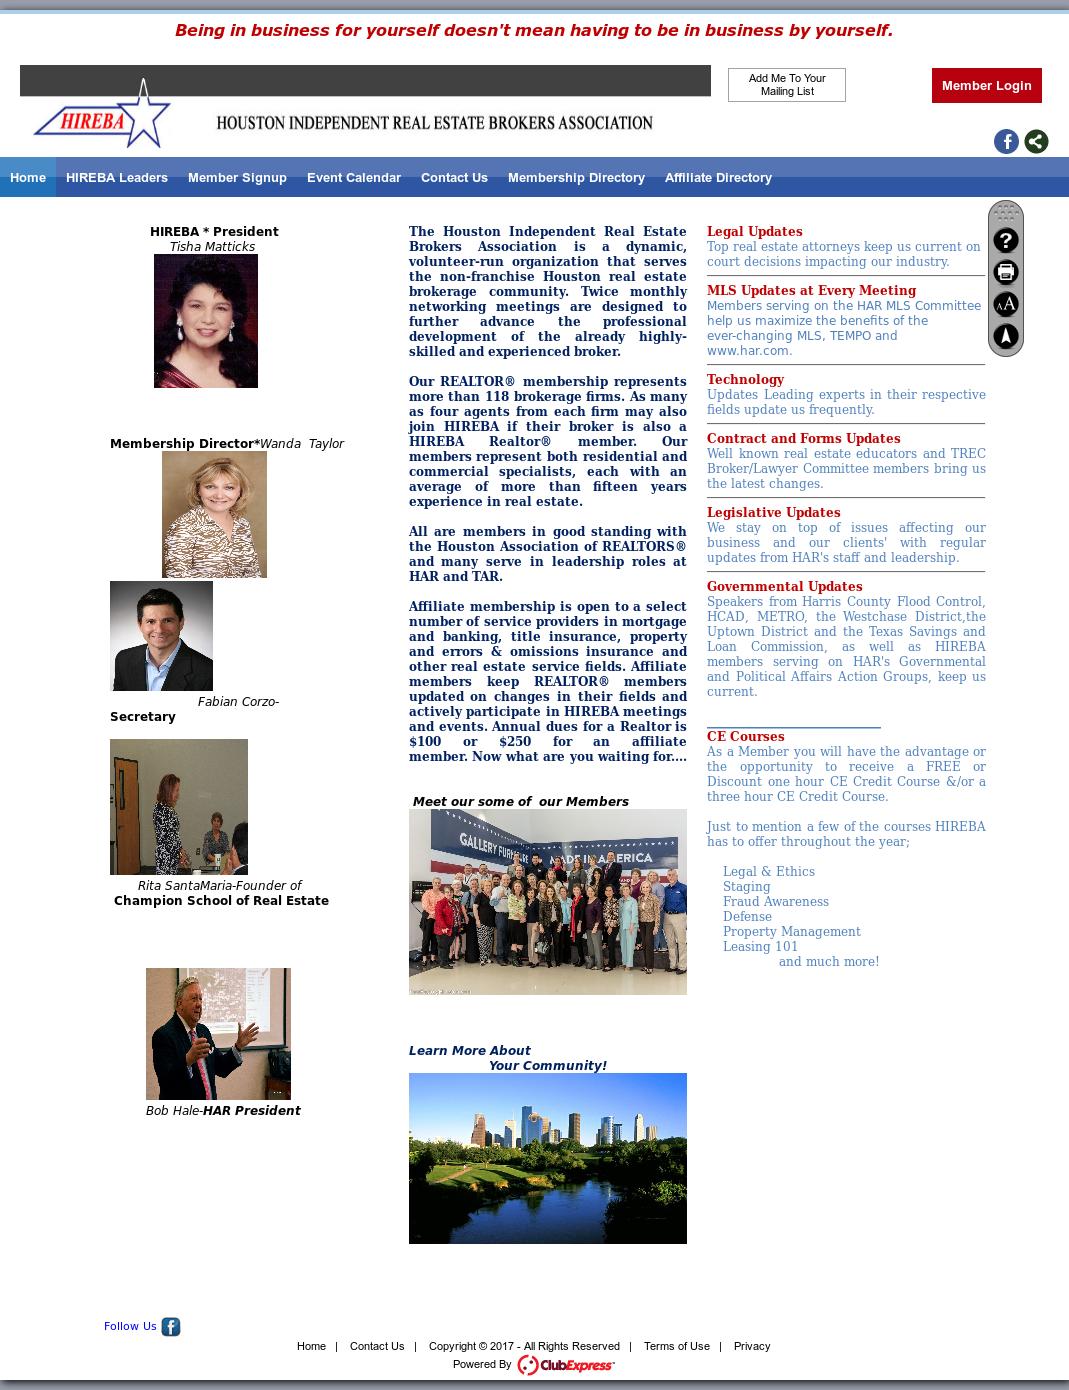 Hireba - Houston Independent Real Estate Brokers Association